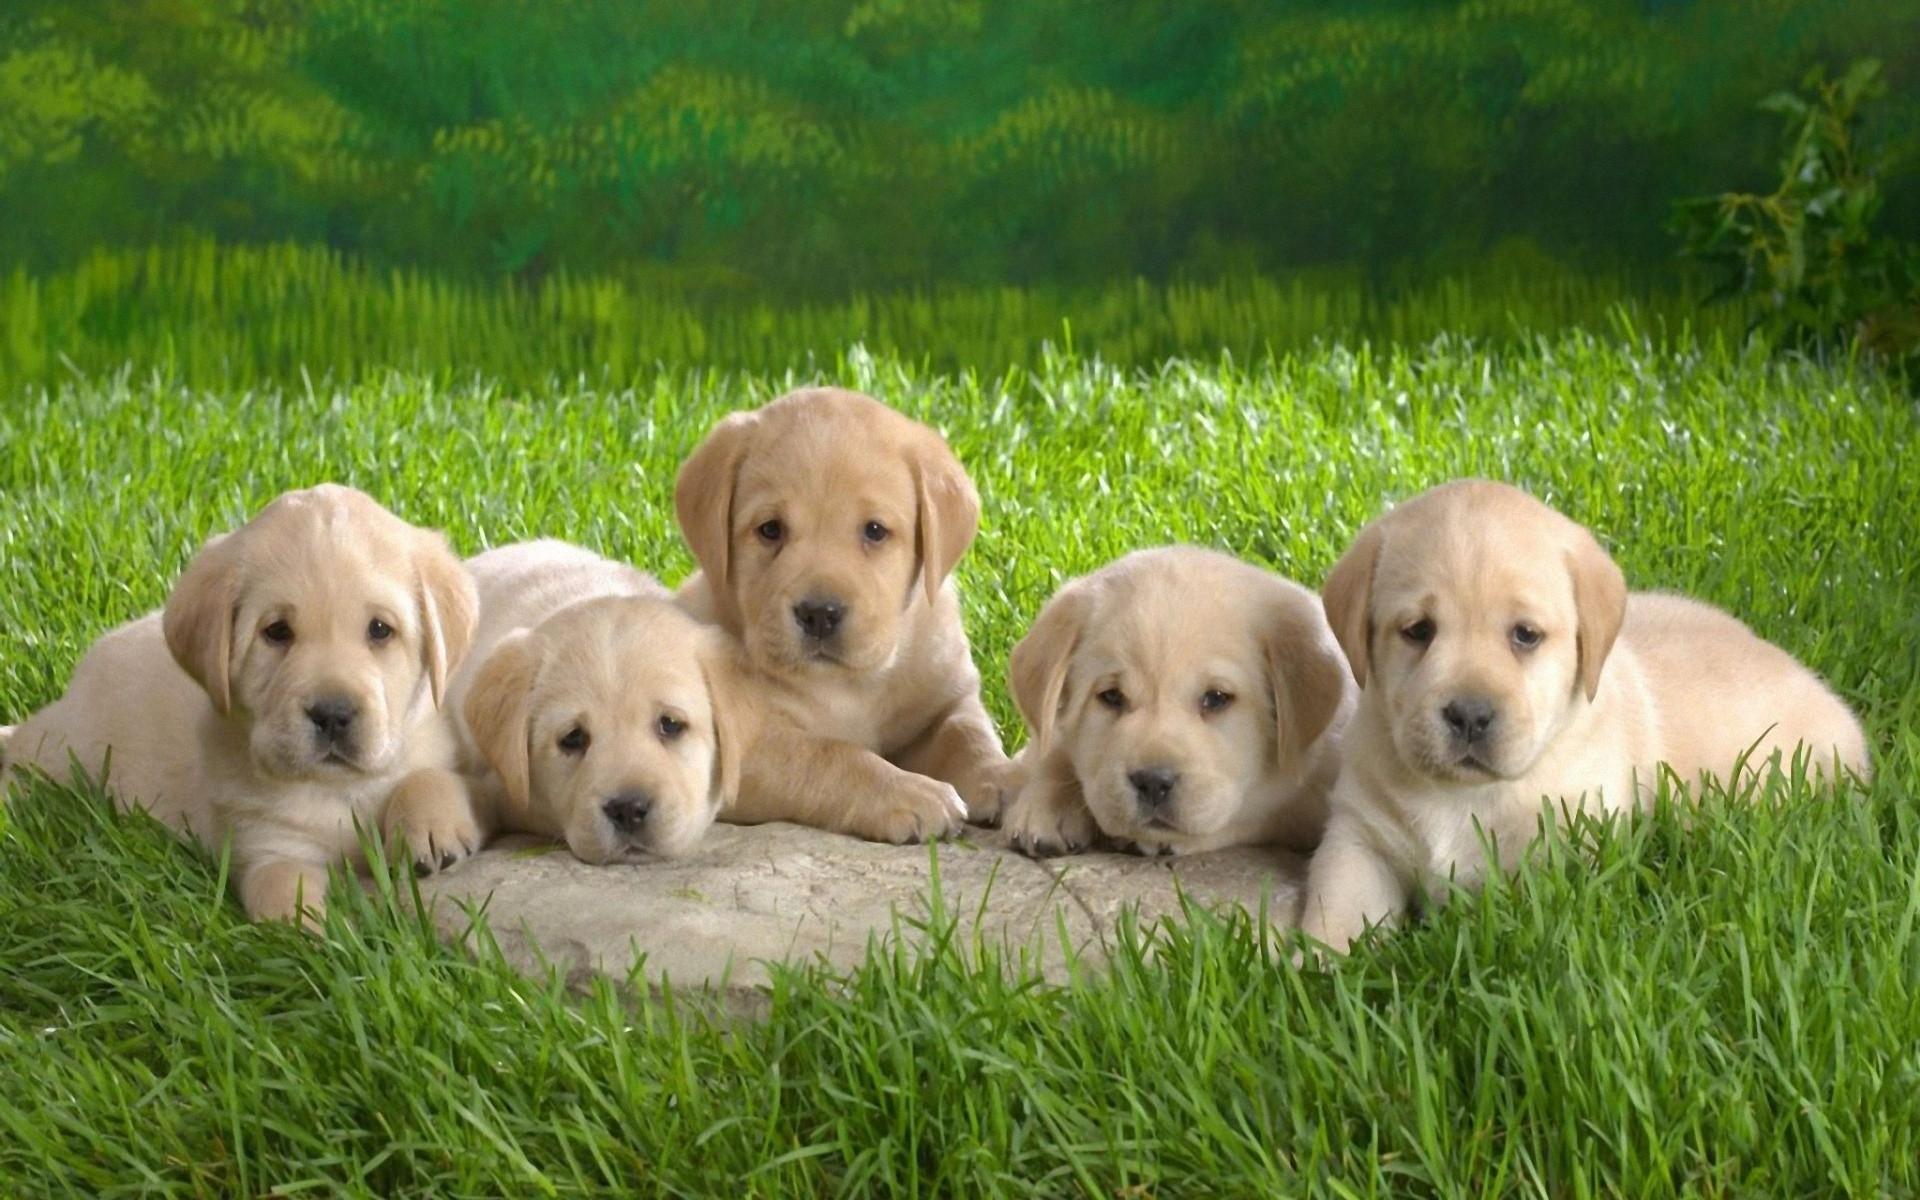 Cute Puppies HD Desktop Wallpaper | HD Desktop Wallpaper